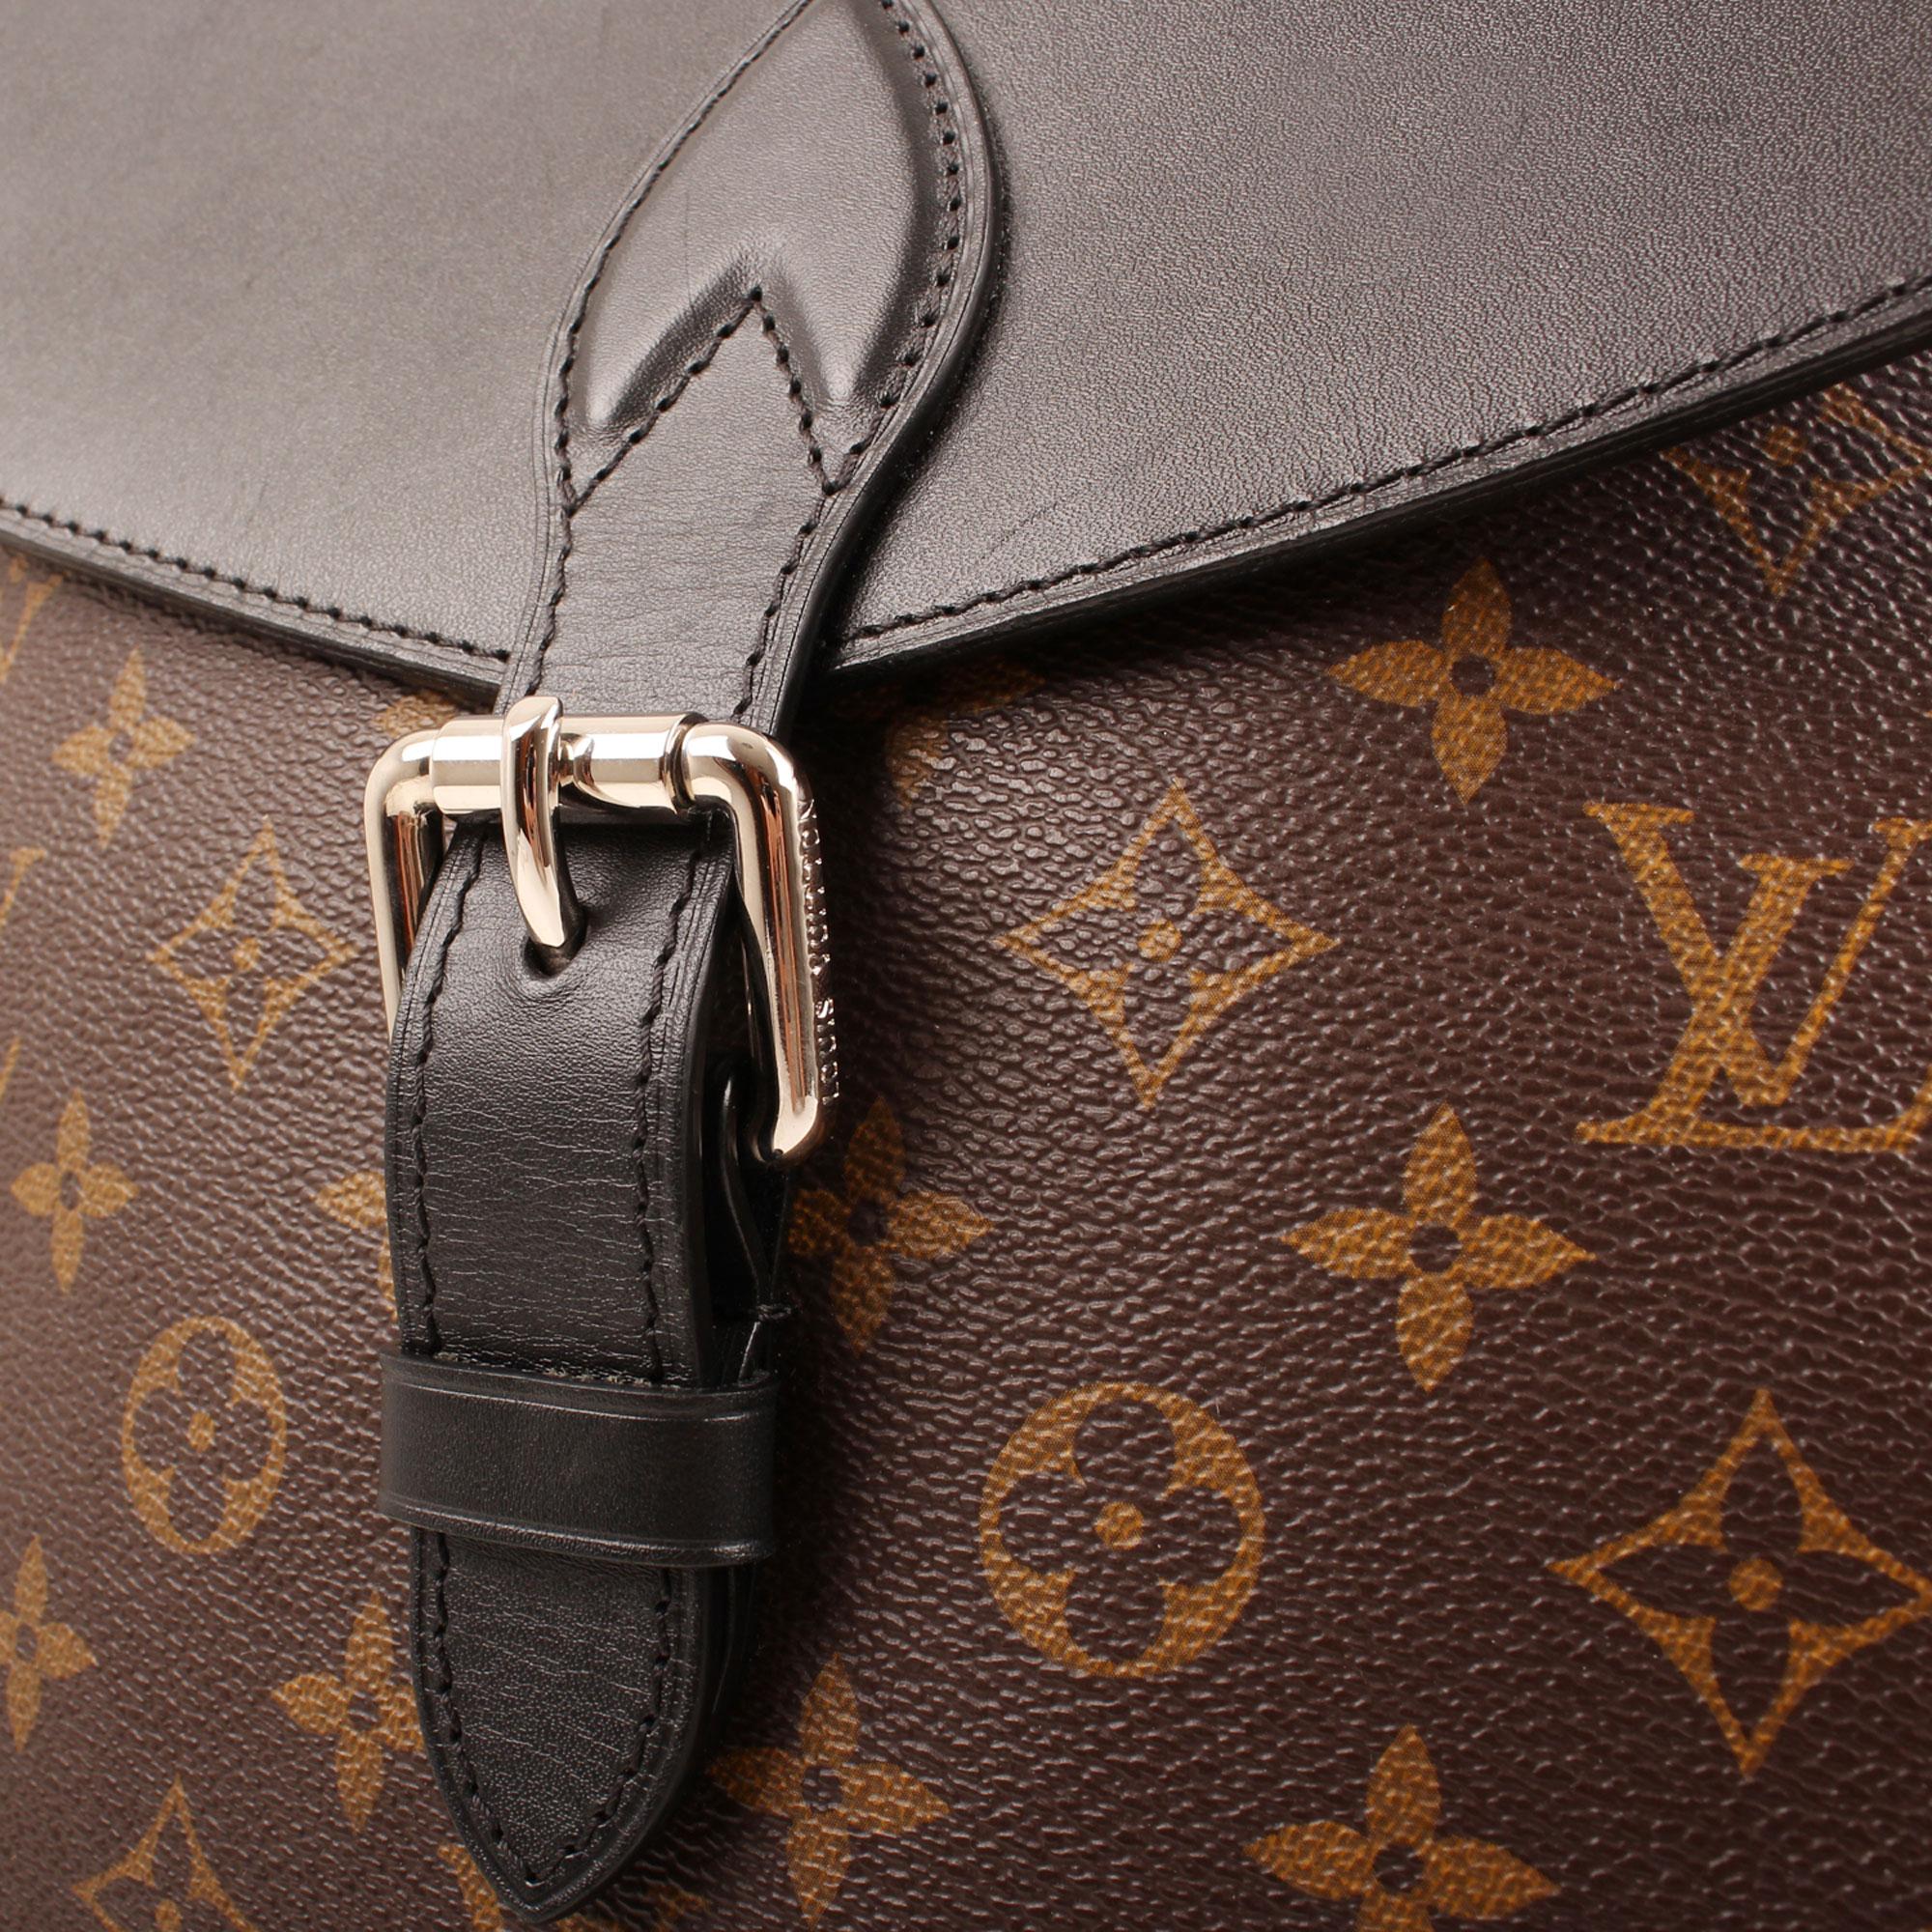 Detail image of louis vuitton palk monogram macassar backpack